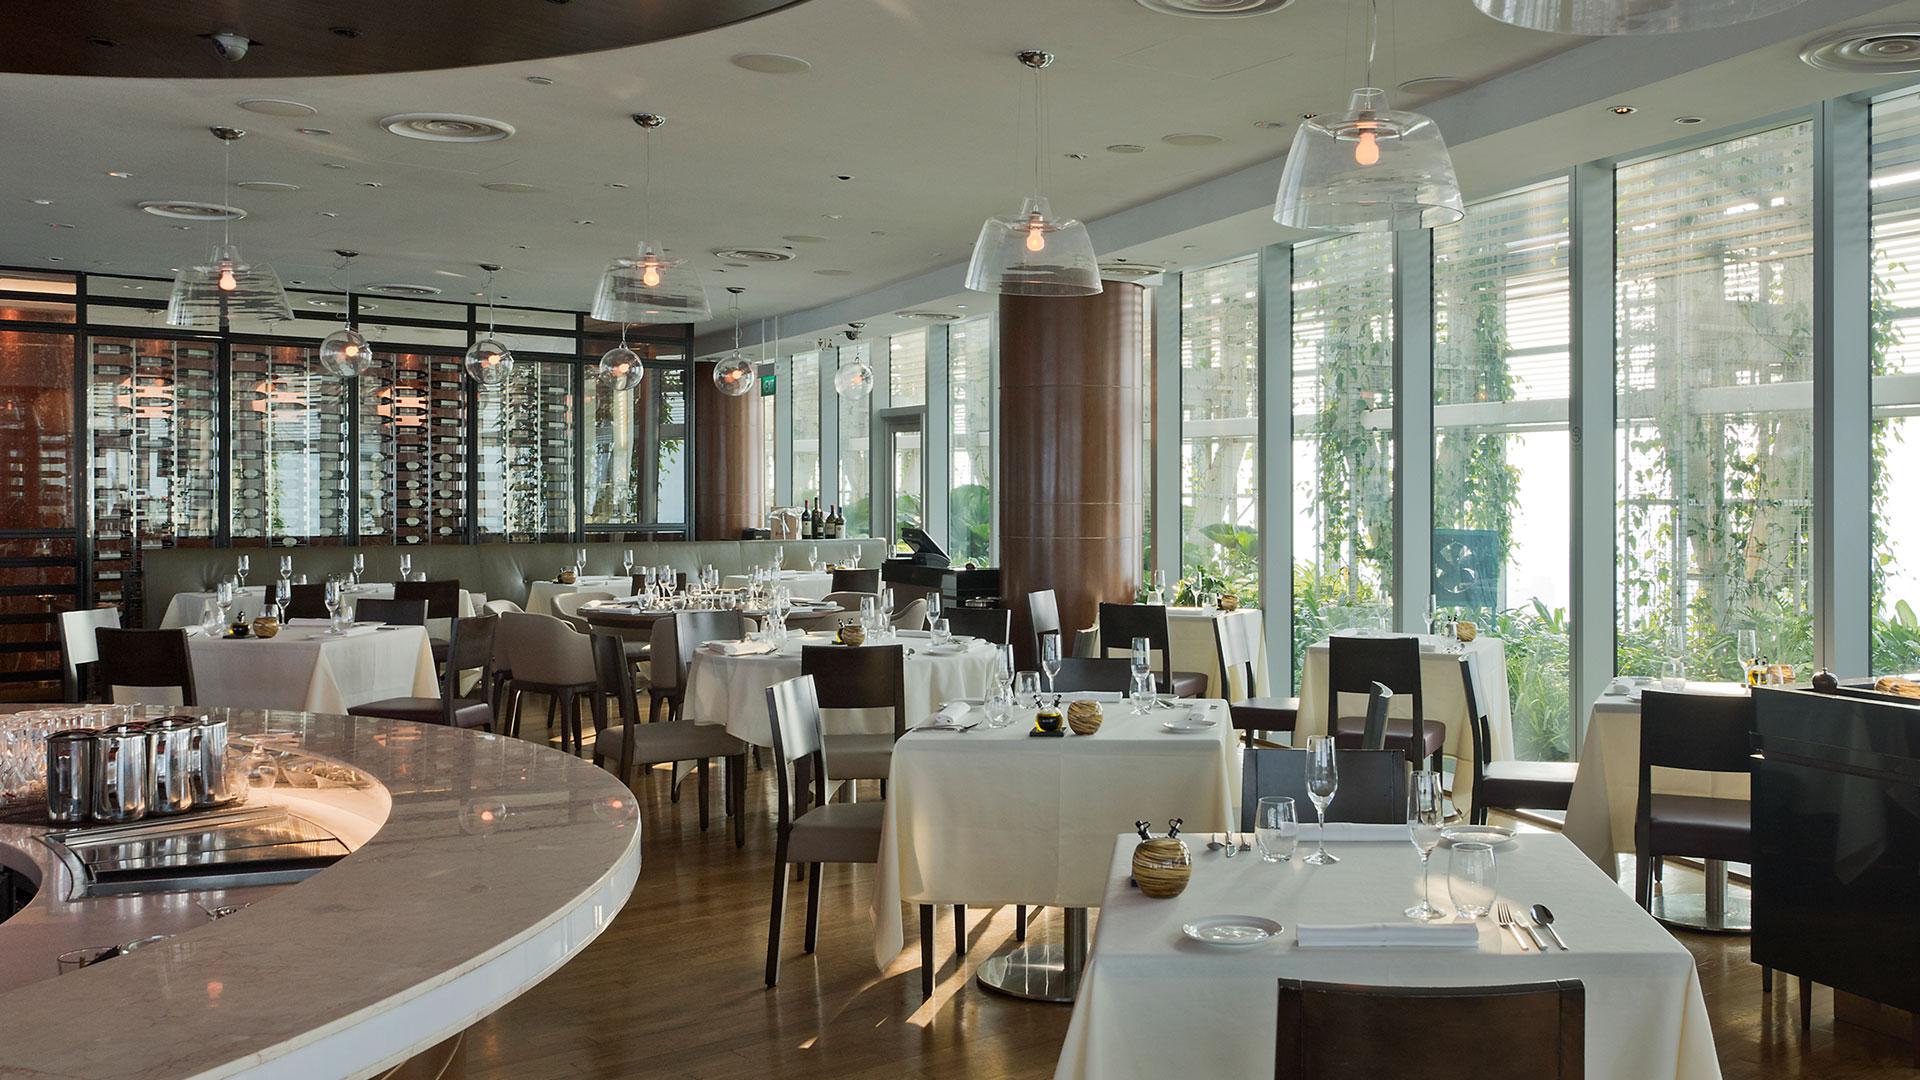 glamourous-f1-party-venuerific-blog-zaferrano-restaurant